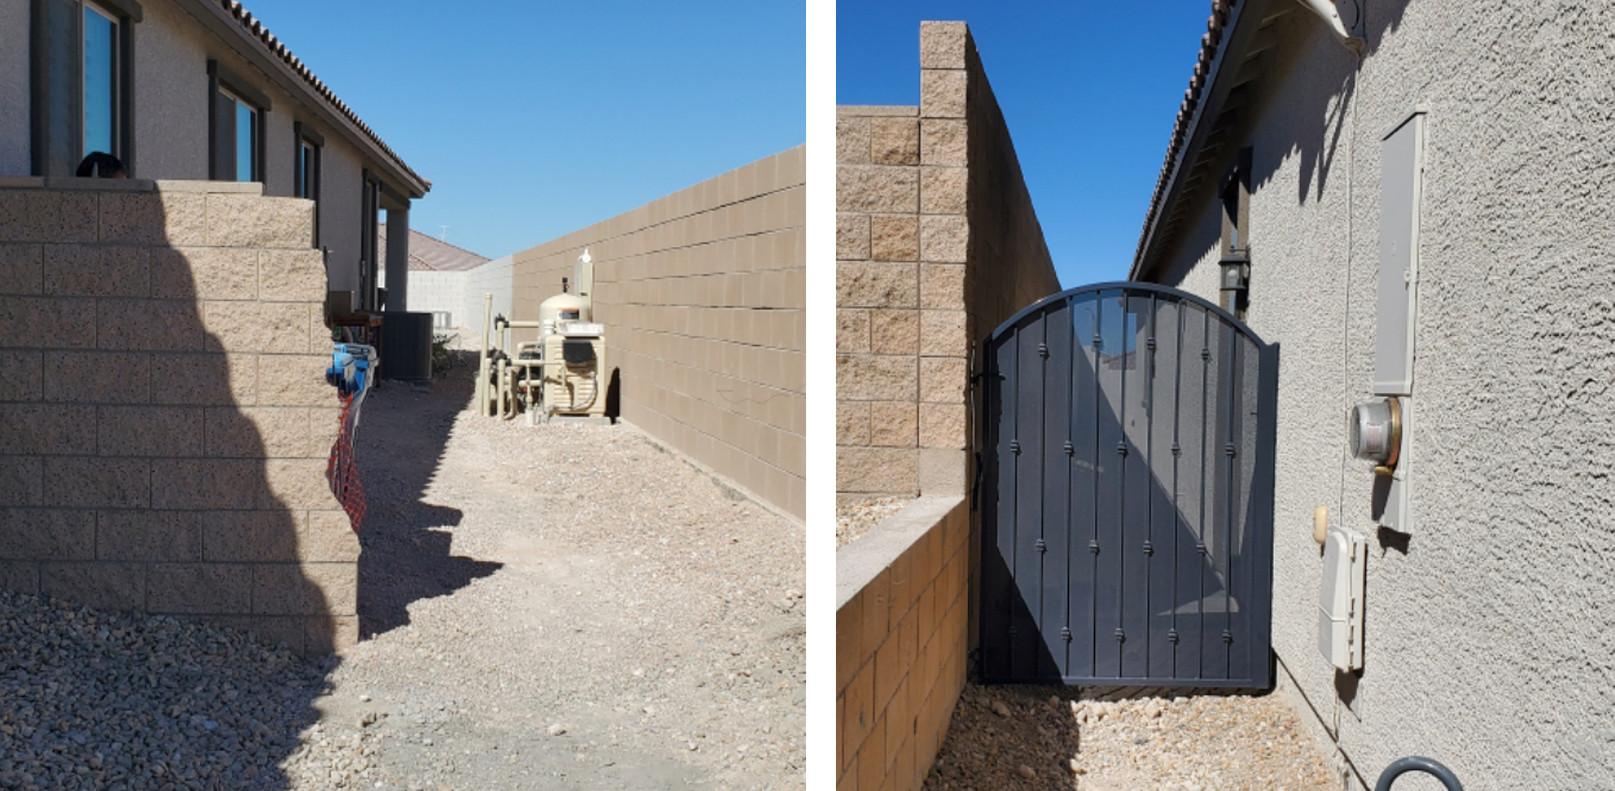 Phase 11: Walls & Gates